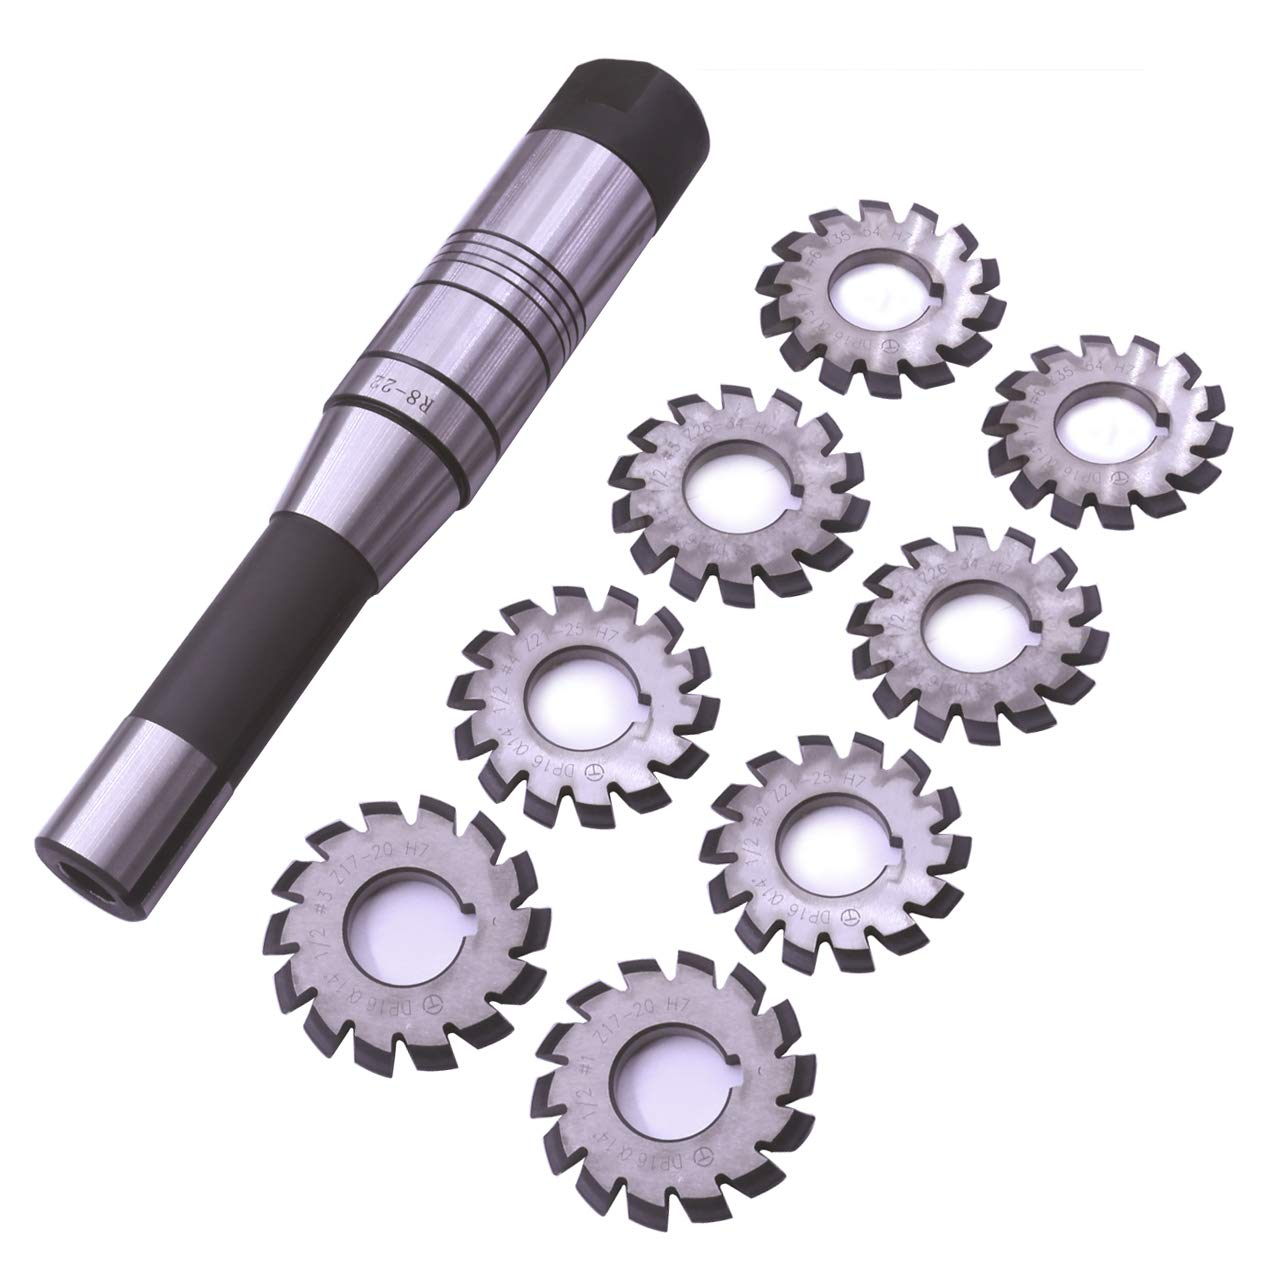 EVNSIX Dp16 PA14-1/2 Bore22 No. 1-8 Involute Gear Cutters+ 7/16 Inch 22mm R8 Shank Milling Arbor Gear Mill Cutter Holder Machine